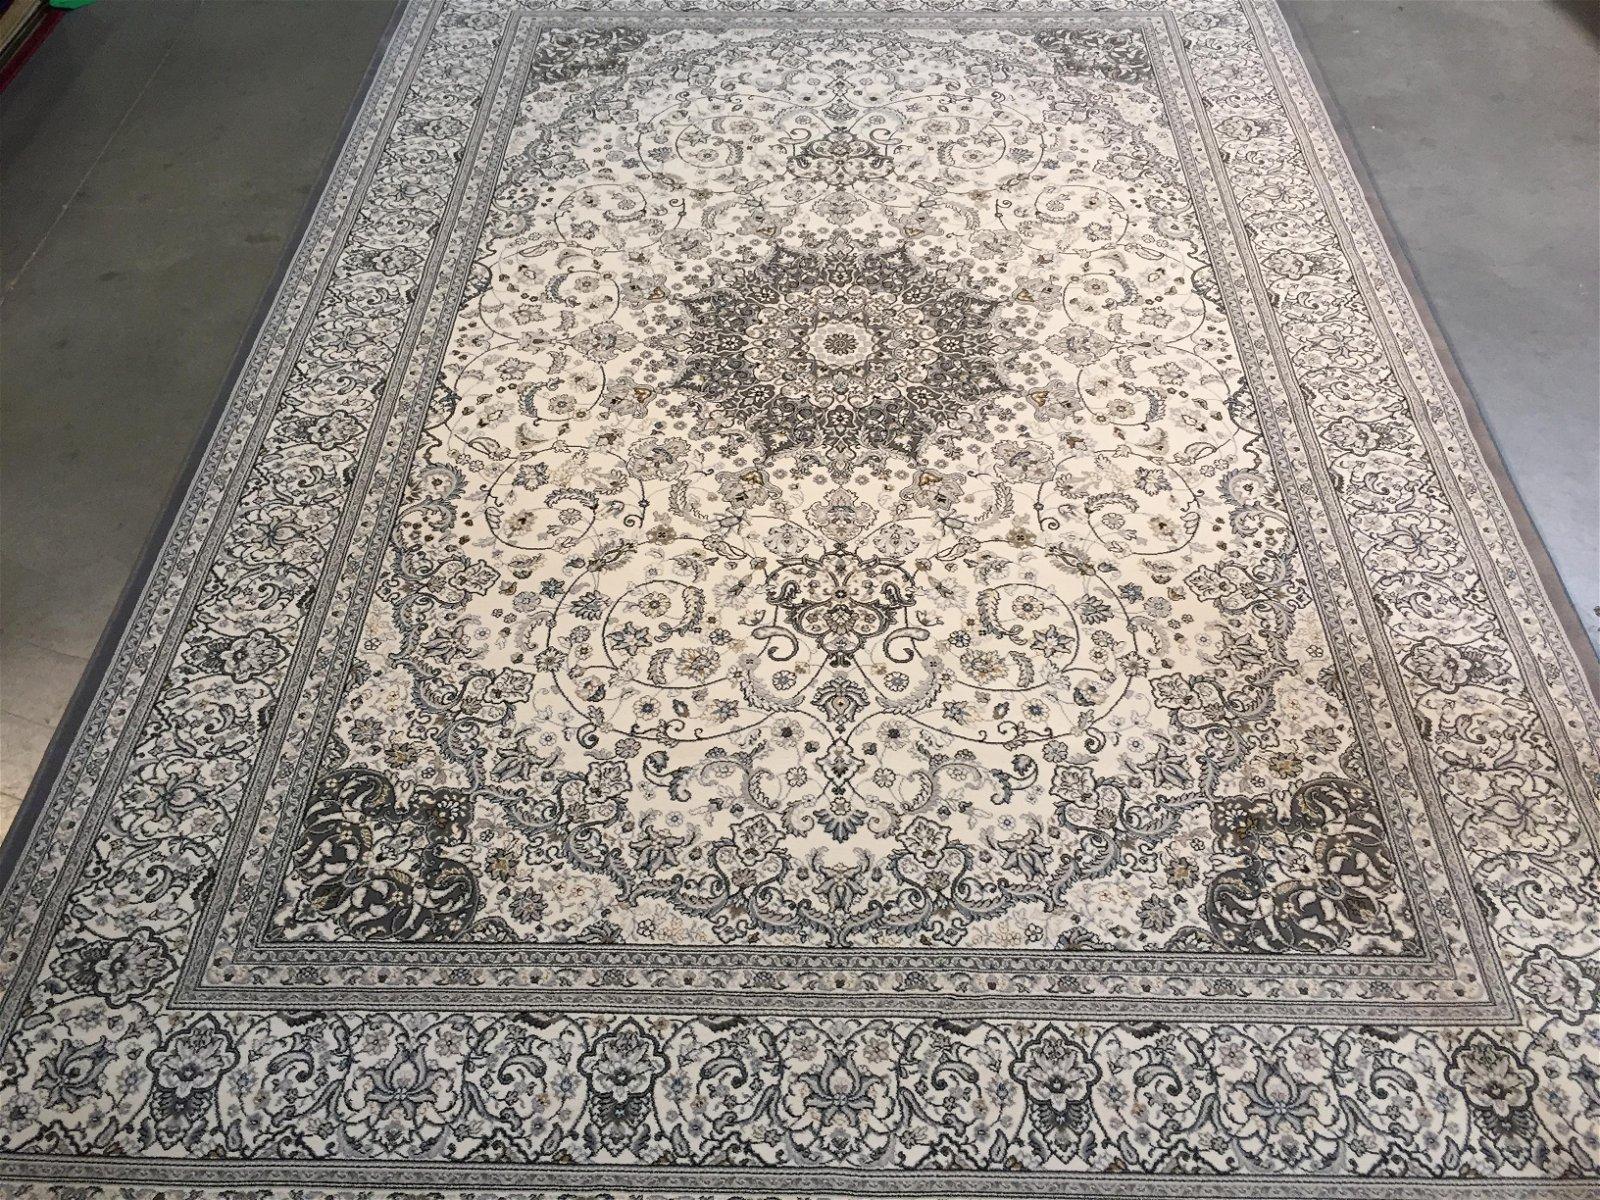 STUNNING PREMIUM PERSIAN ISFAHAN DESIGN AREA RUG 9x13